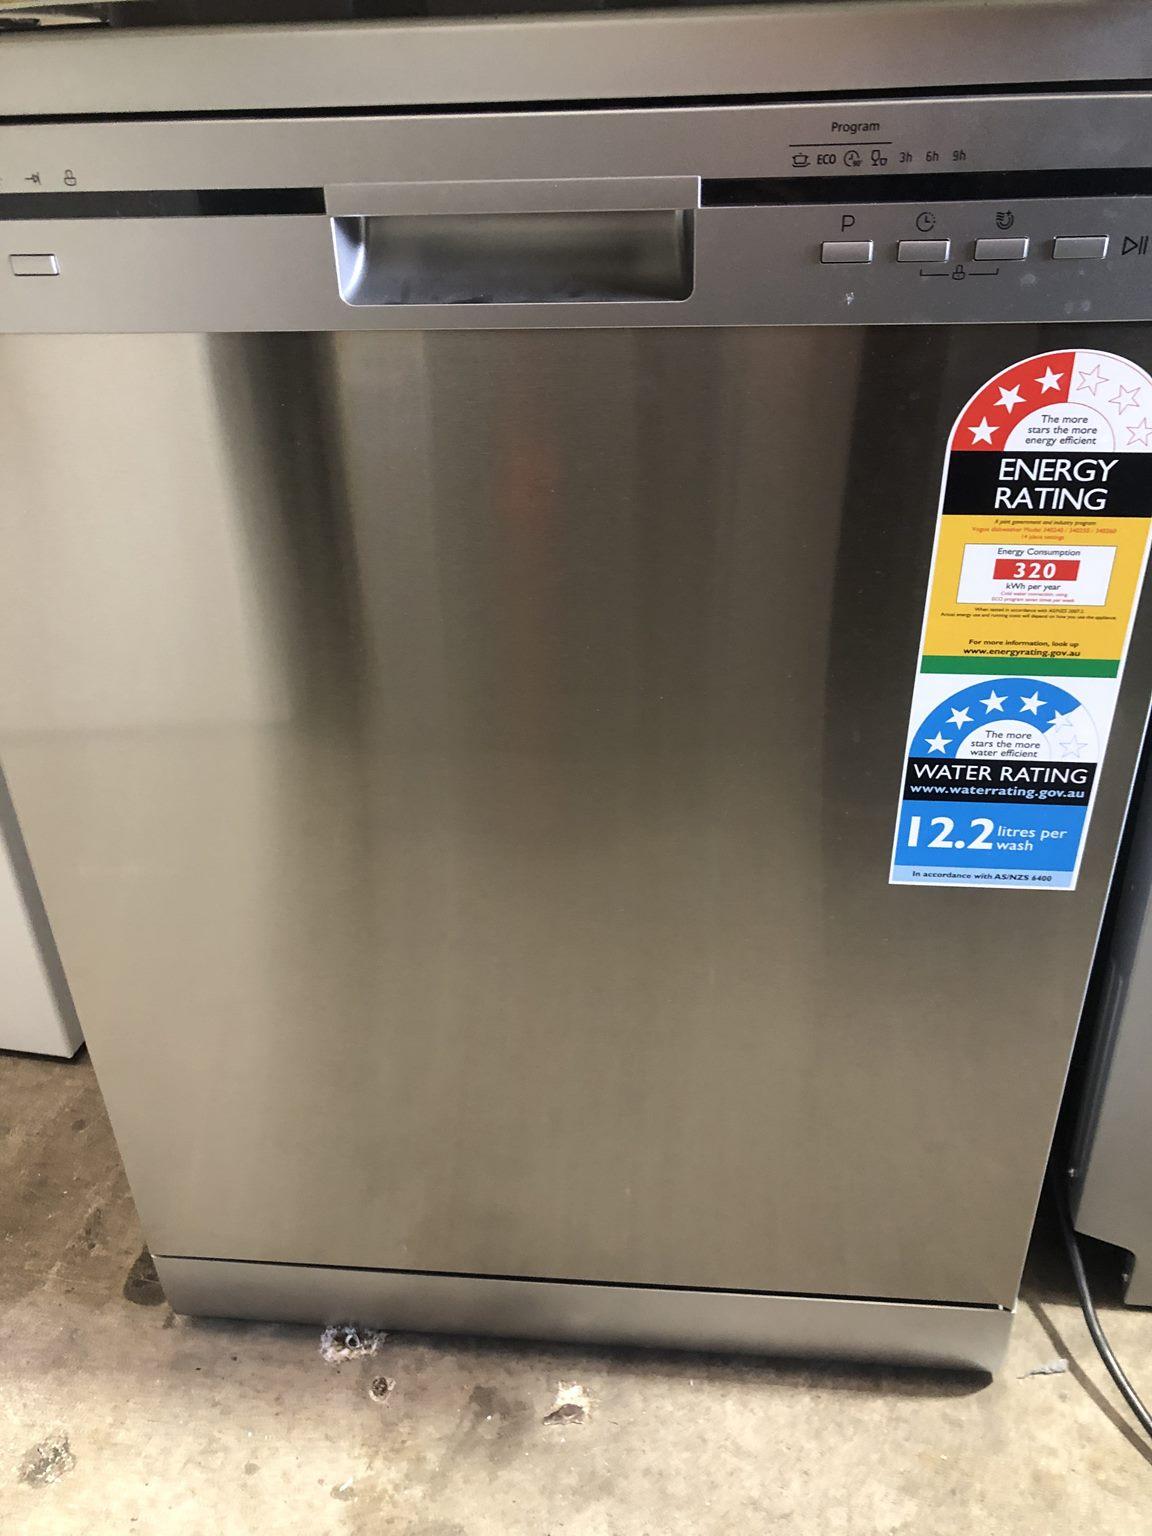 Vogue Dishwasher ,Moon Freestanding Dishwasher 60cm